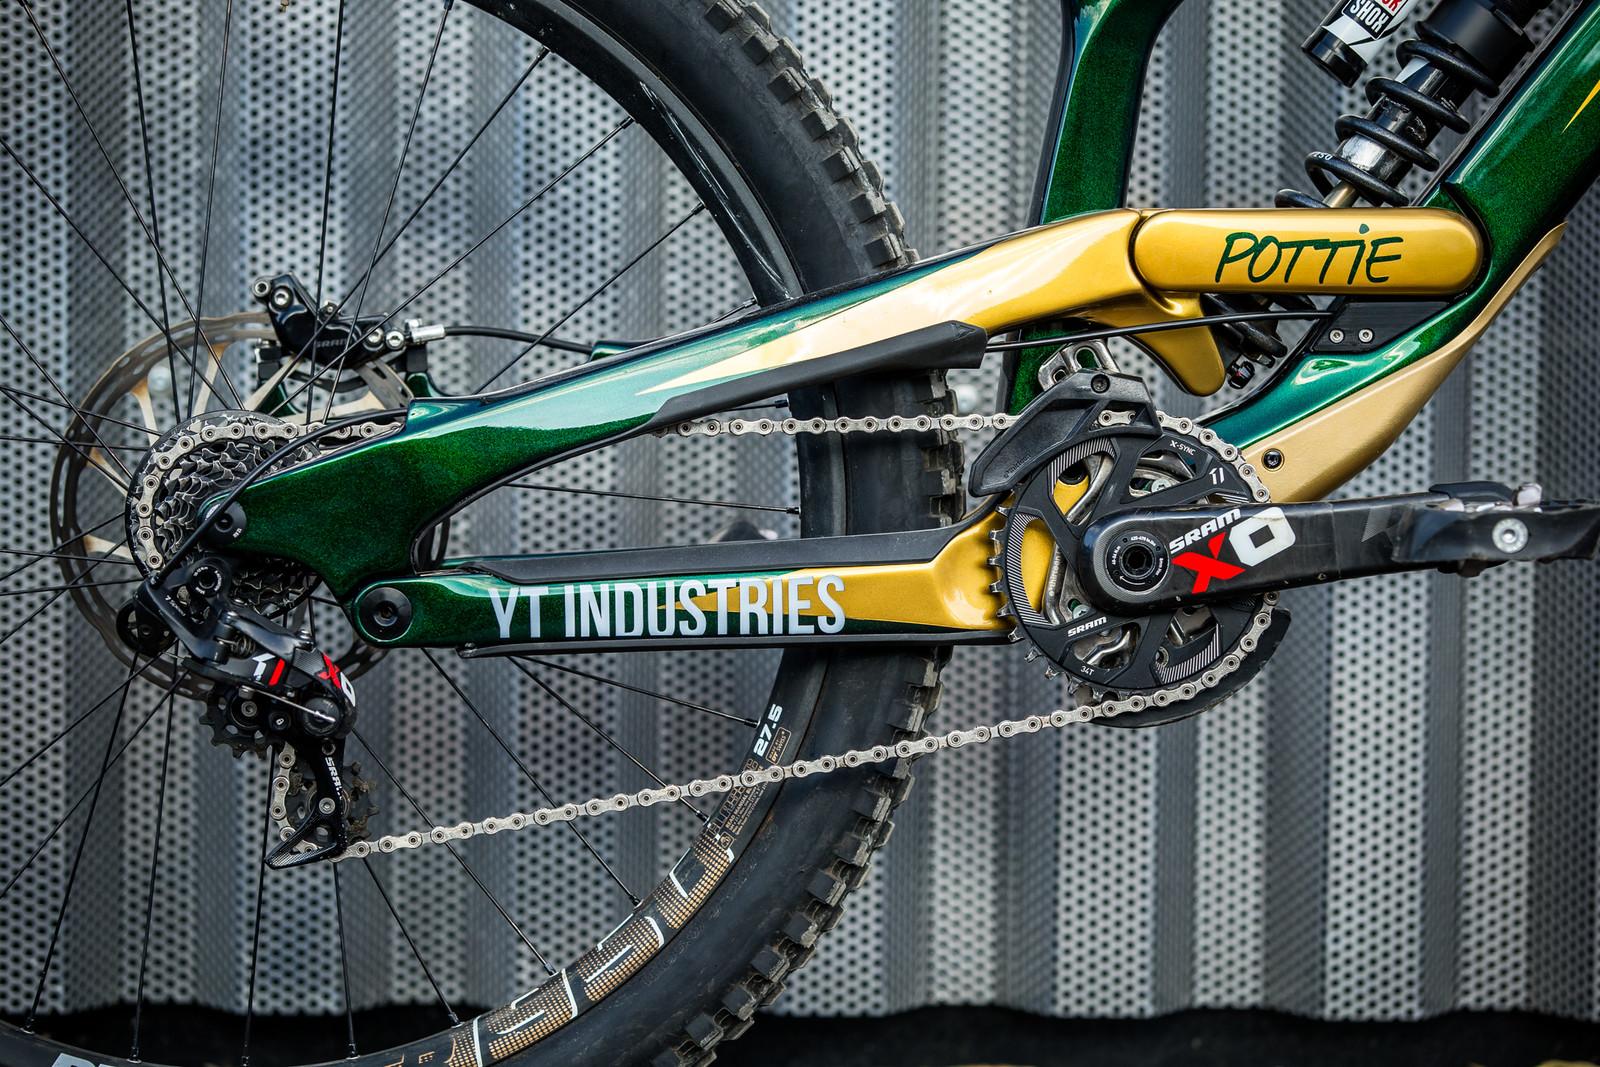 Pottie - WORLD CHAMPS BIKE - Johann Potgieter's YT TUES - Mountain Biking Pictures - Vital MTB